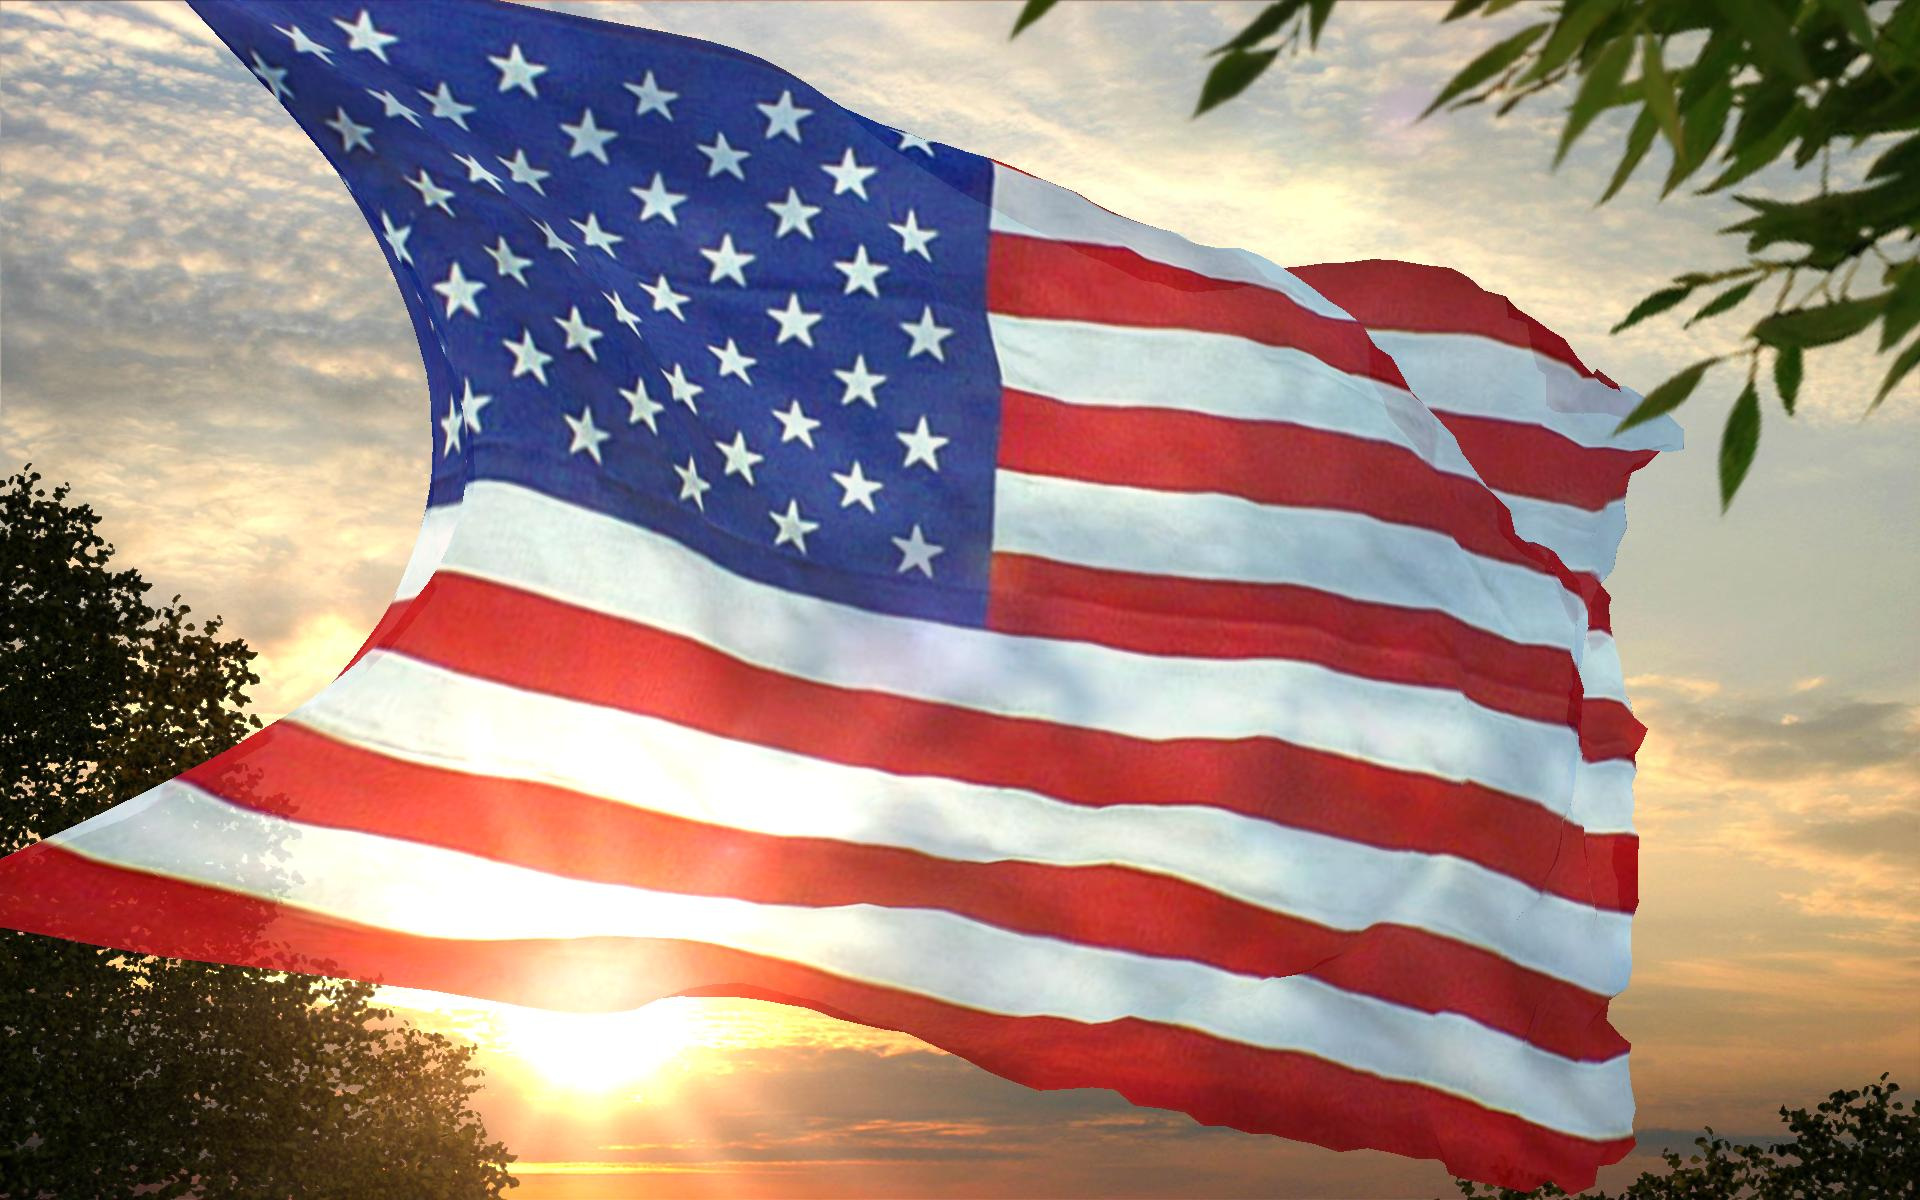 USA American Flag Wallpaper 13065 Wallpaper Cool Walldiskpapercom 1920x1200